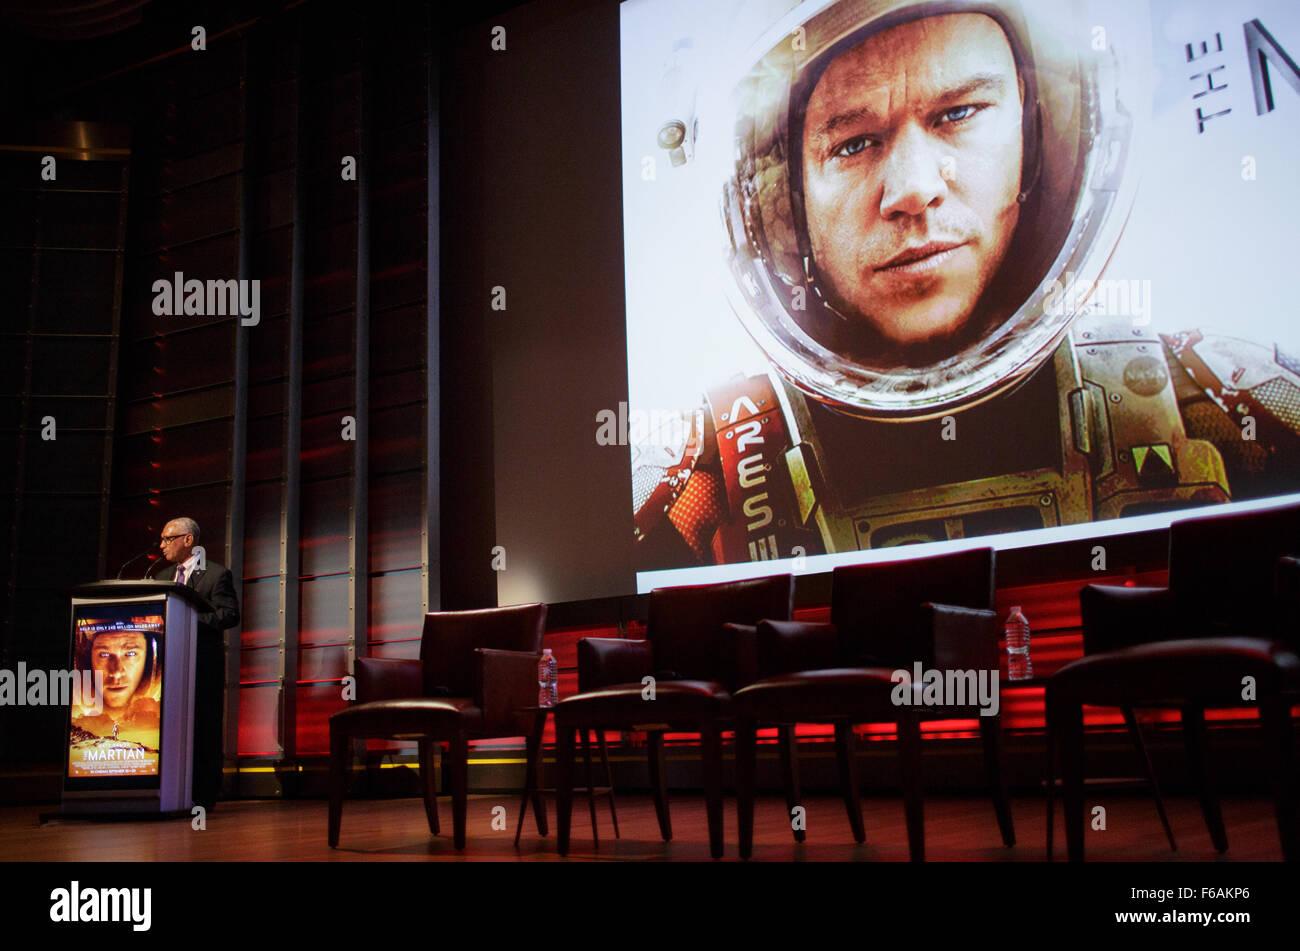 Screening of 'The Martian' - Stock Image